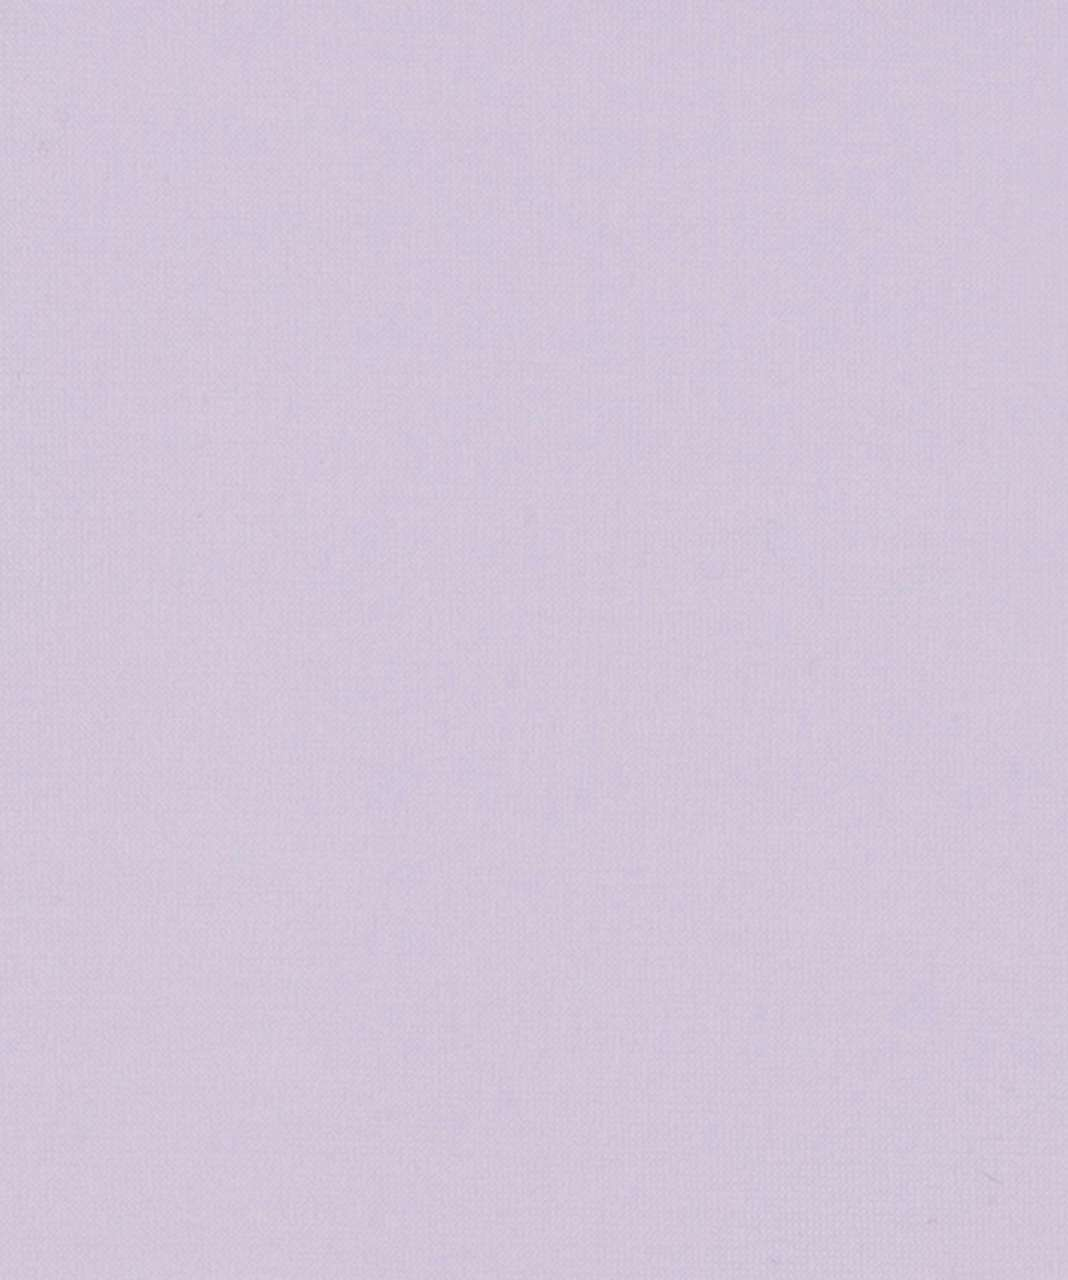 Lululemon Smooth Seamless Hipster 3 Pack - Lavender Dew / Pink Mist / Rhino Grey